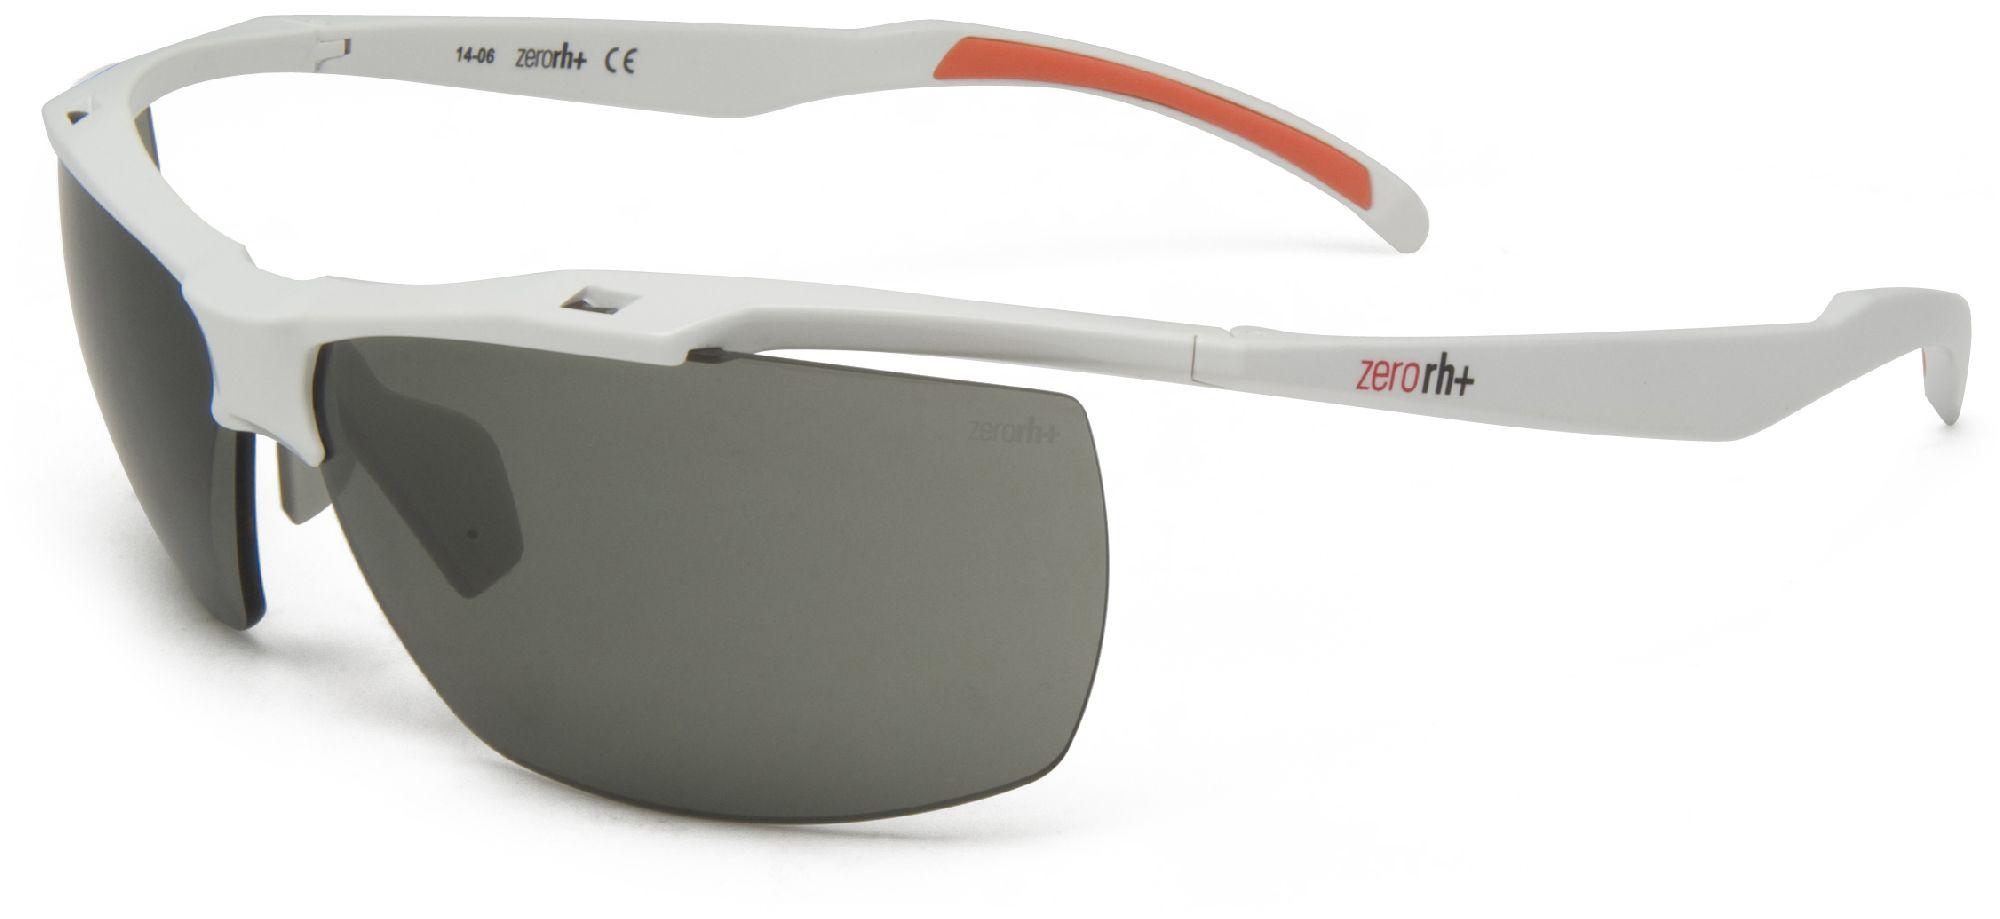 RH+ Okulary rowerowe Mythos 0RH833Z 12 szare 0RH833Z